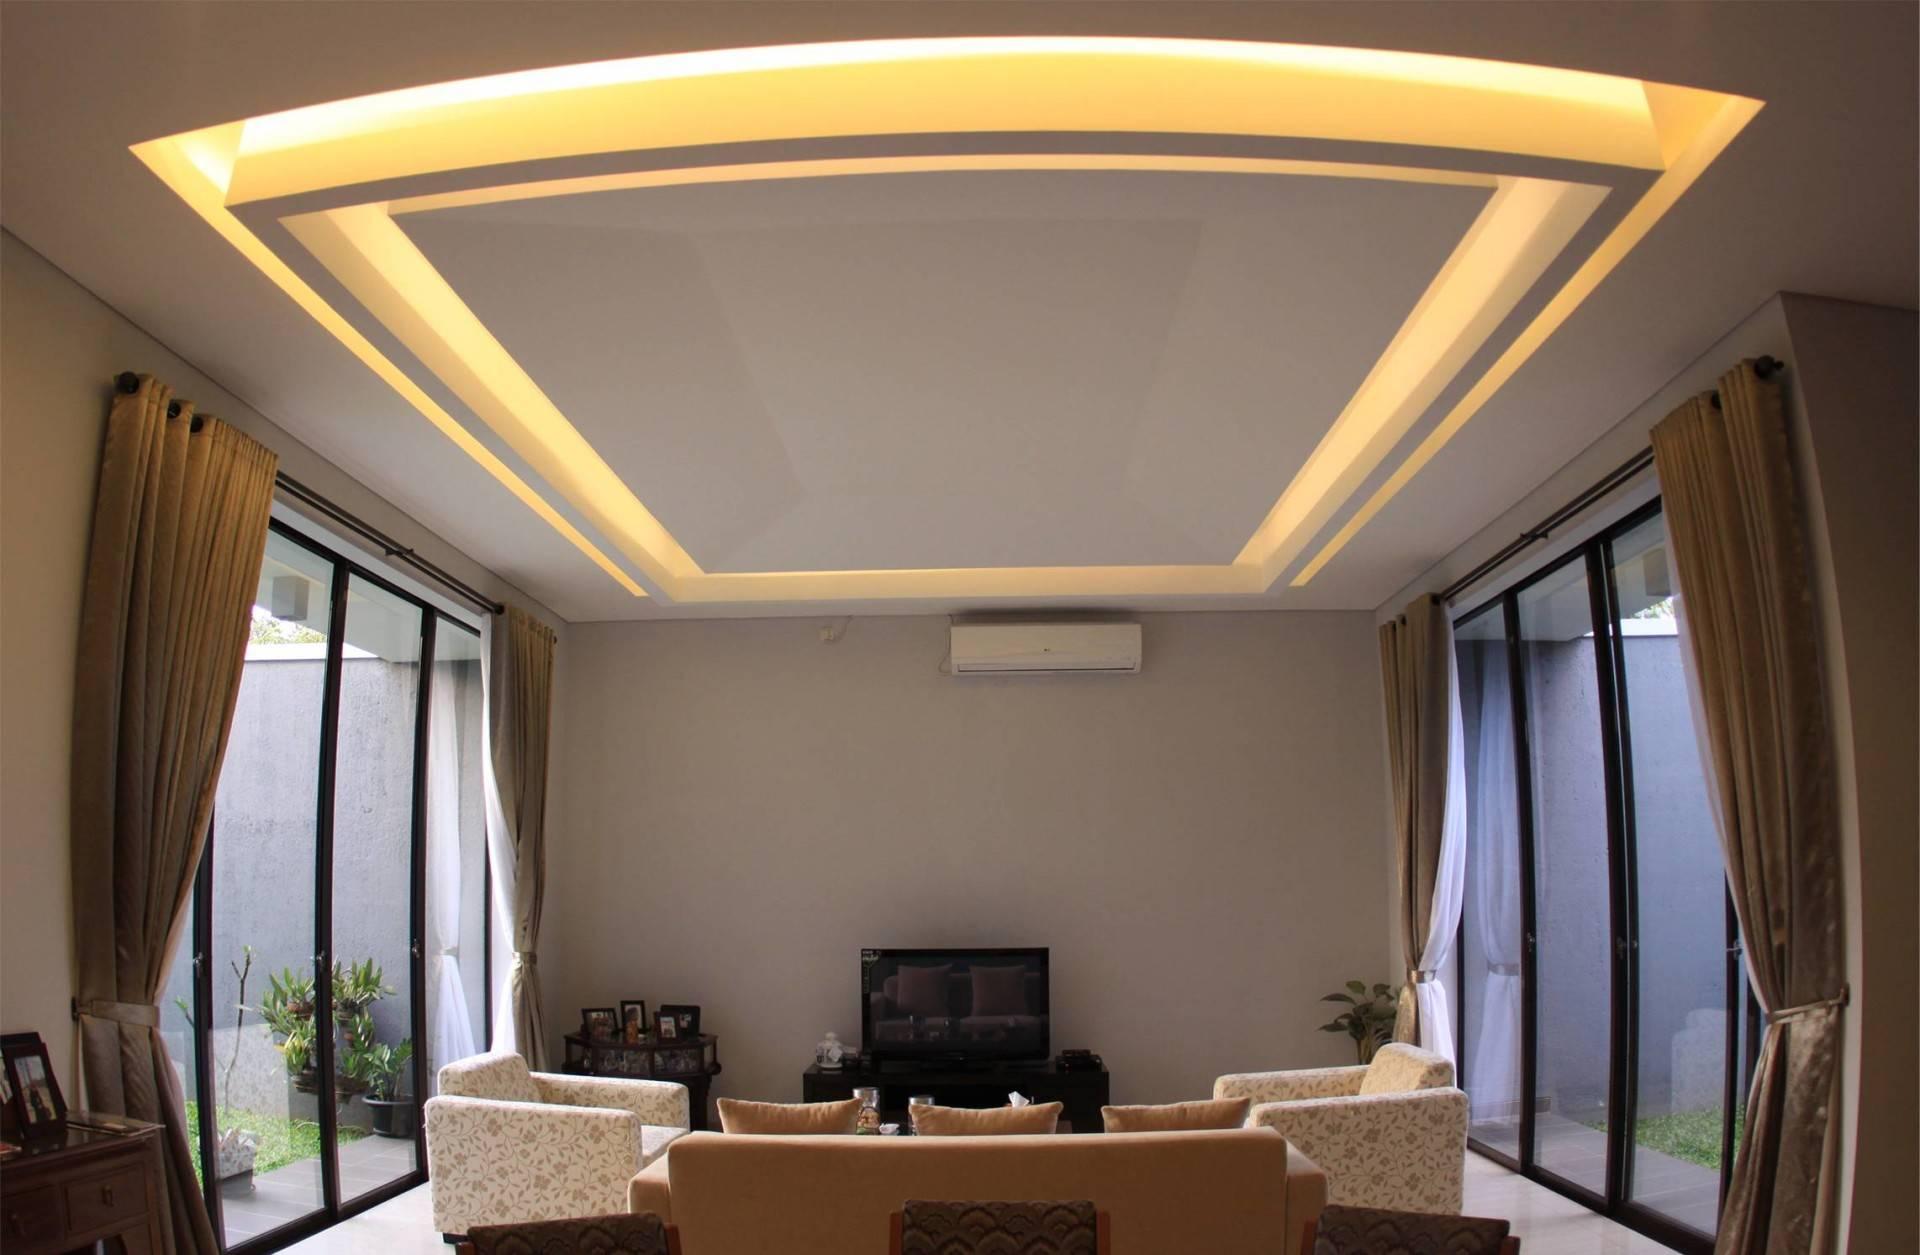 Phidias Indonesia Gura-Gura House Duren Tiga, South Jakarta Duren Tiga, South Jakarta Living Room Modern  2451